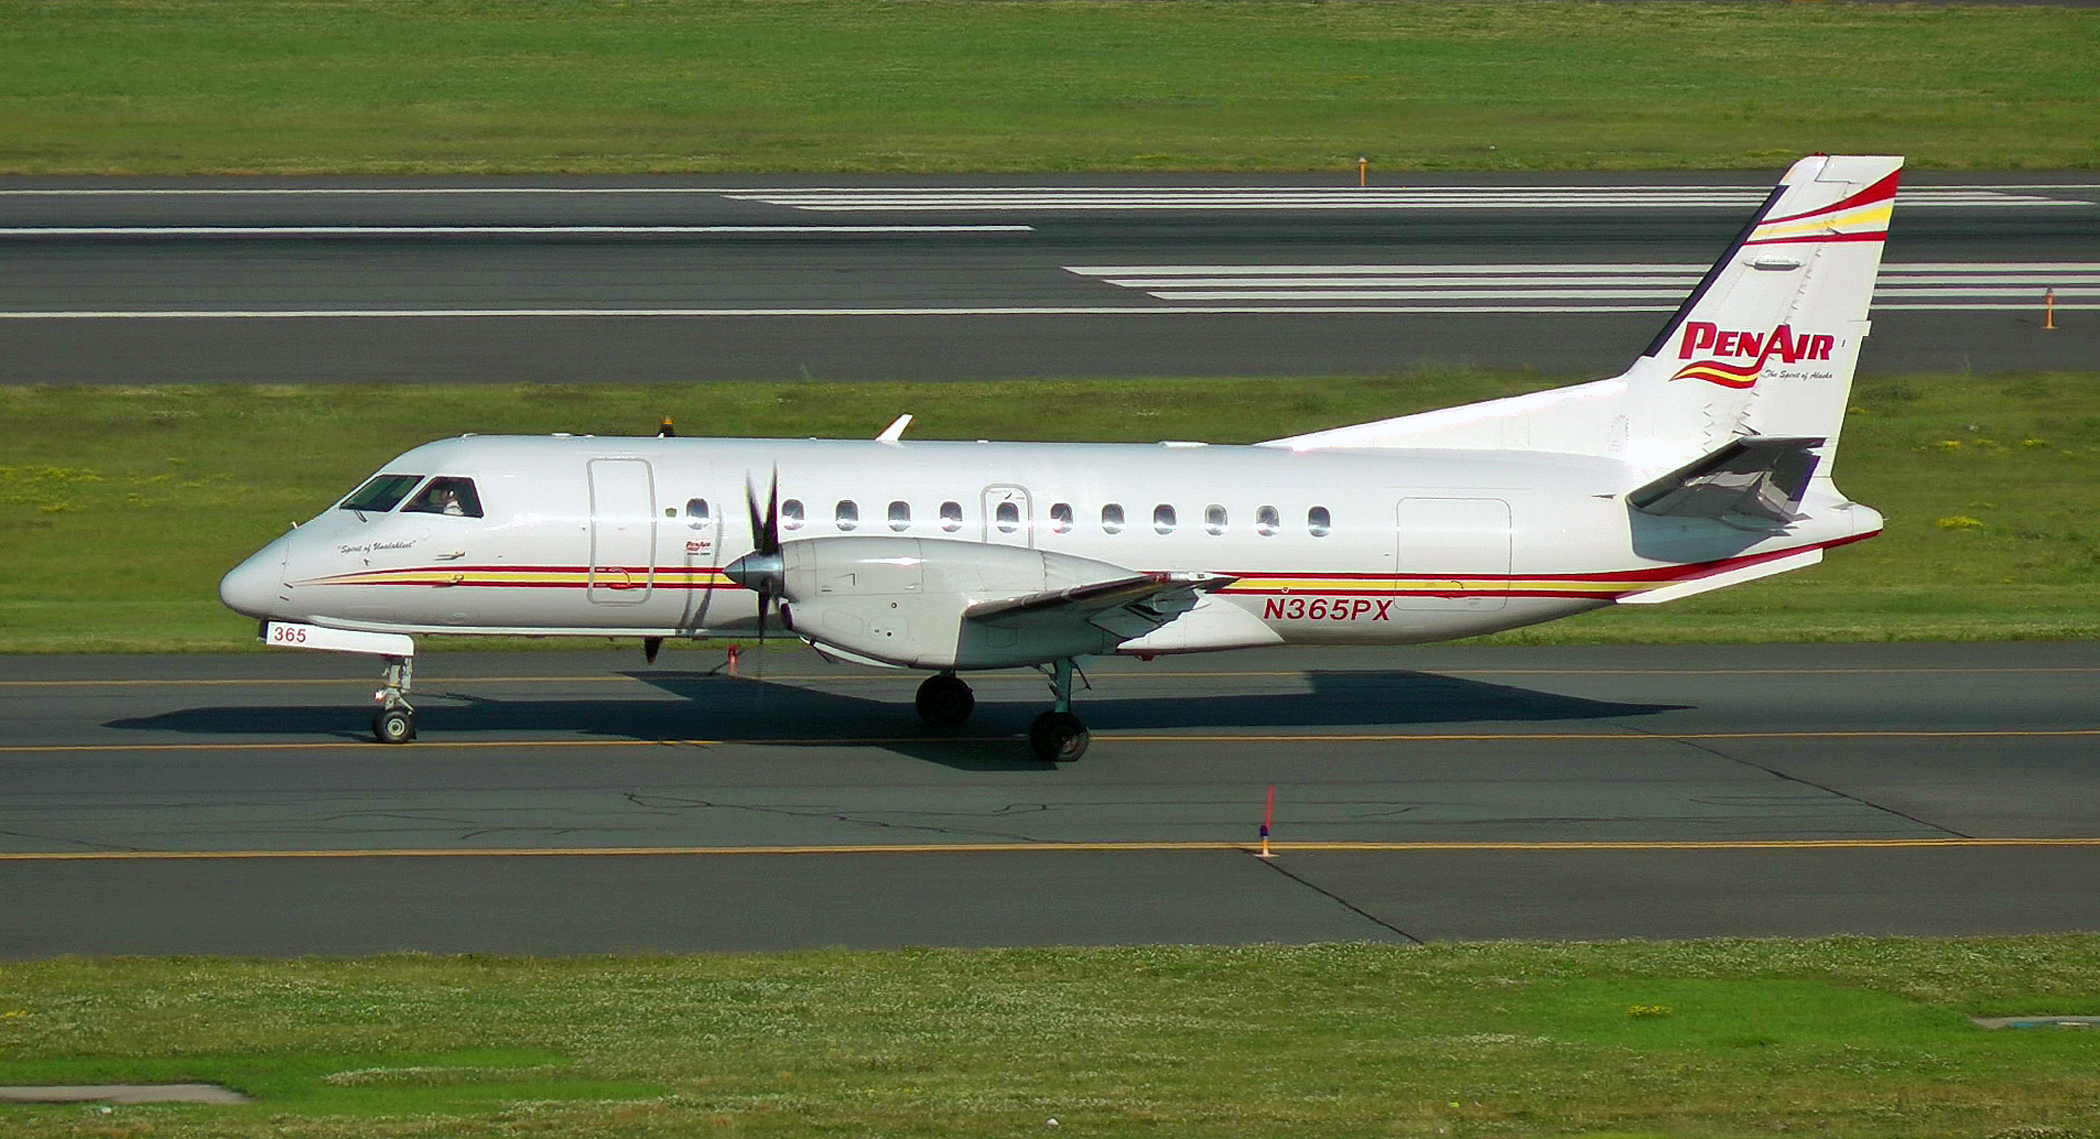 File:PenAir Saab 340B.jpg - Wikimedia Commons